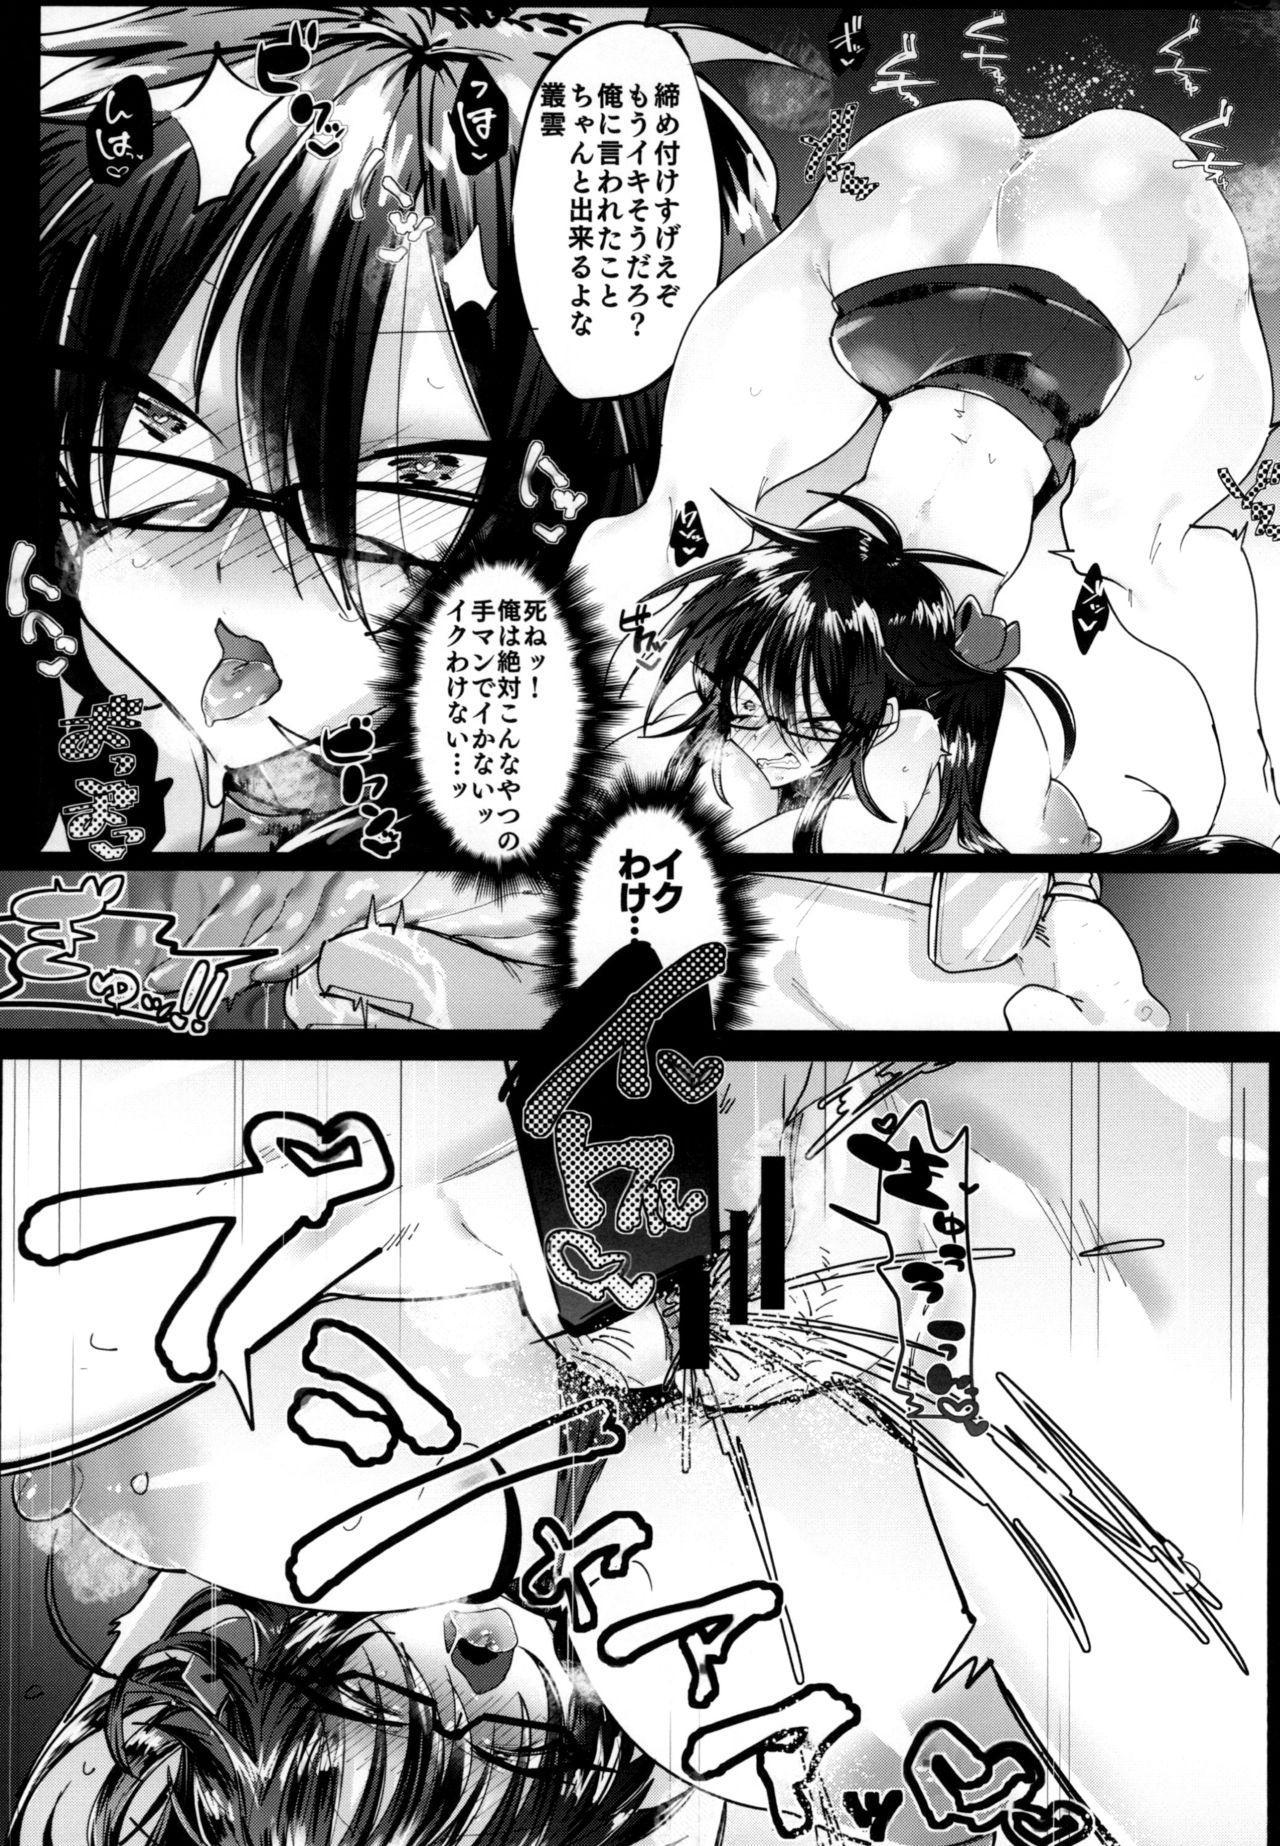 Kurokami Sanpakugan Megane Danshi TS Kyousei Fukujuu Fuck 15